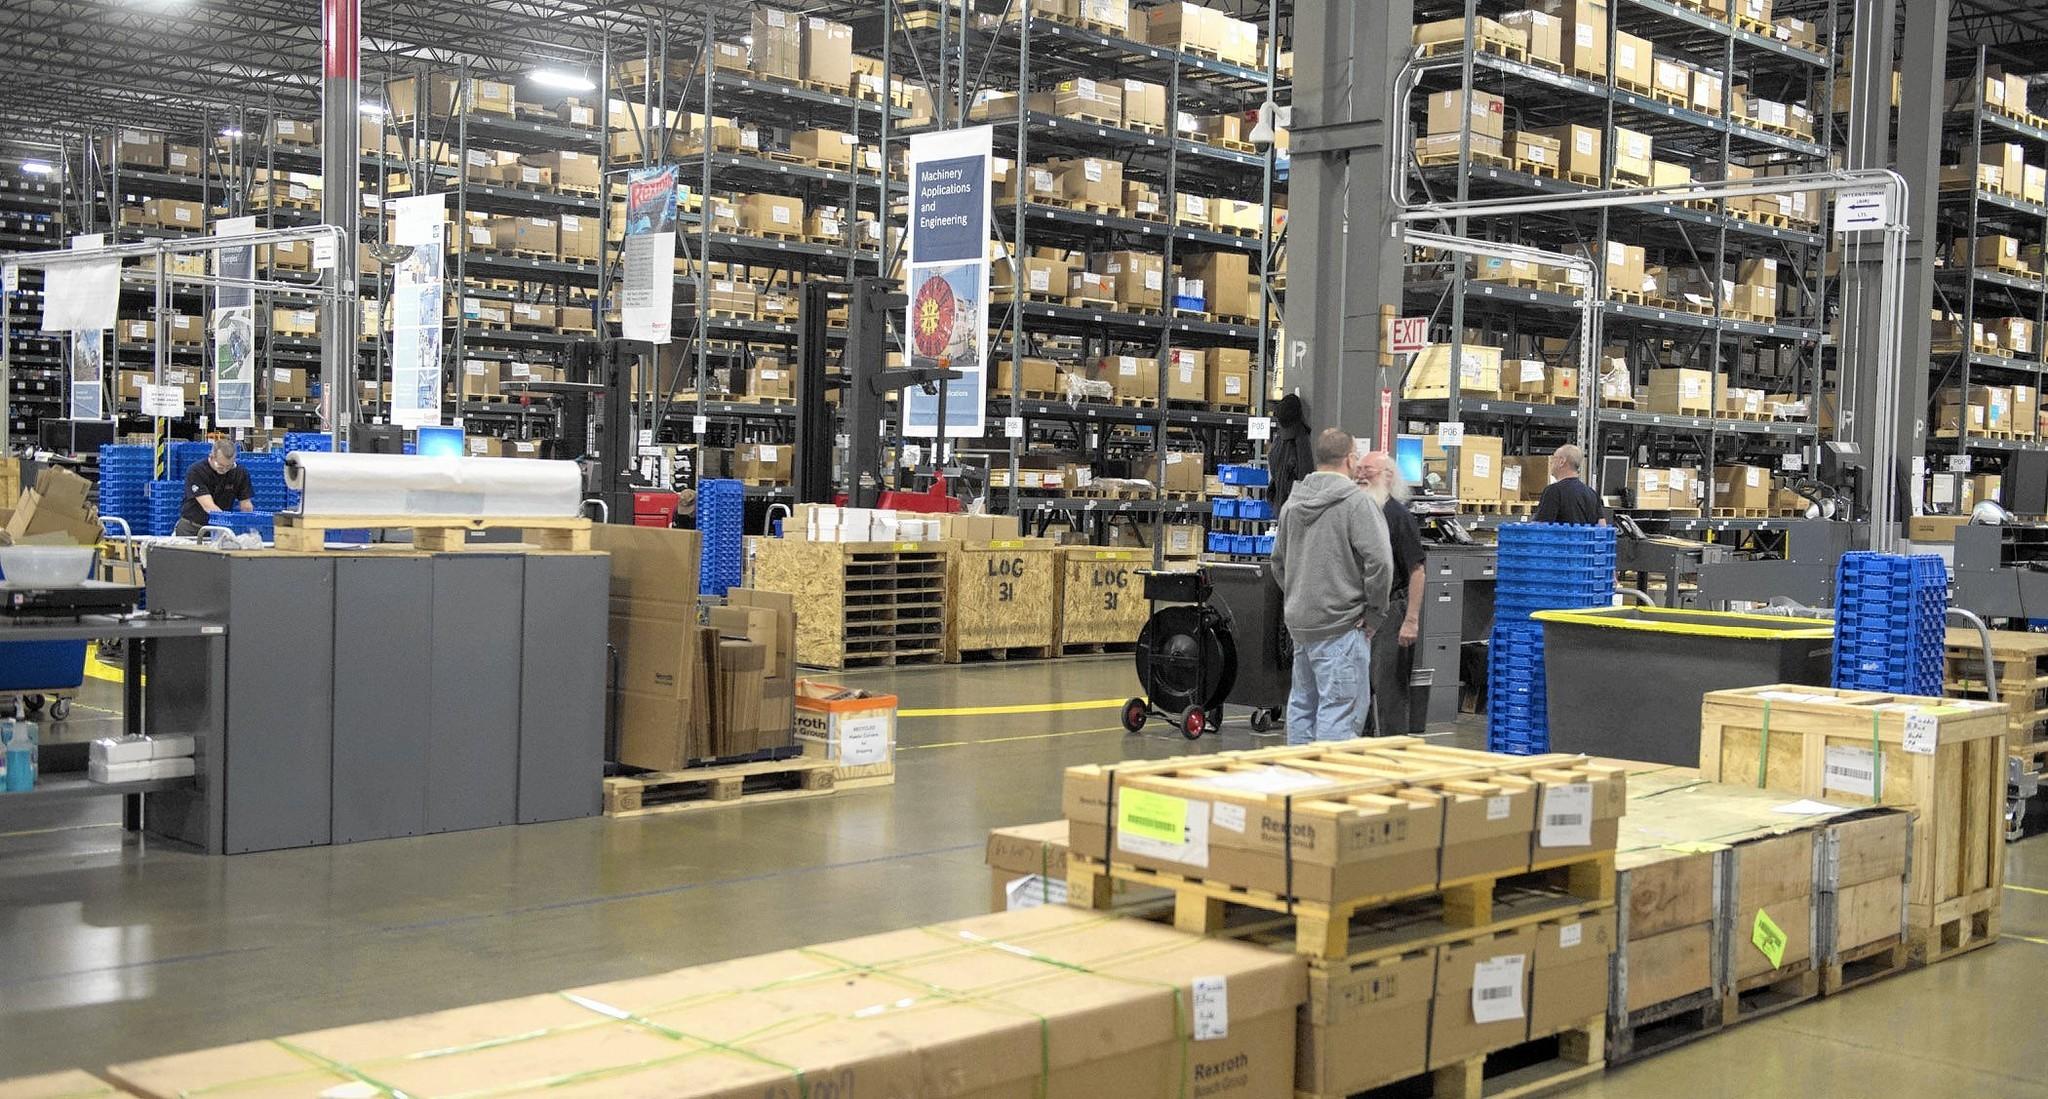 [recovery mode] Автоматизация склада в Bosch Rexroth: ПО, железо, интеграция